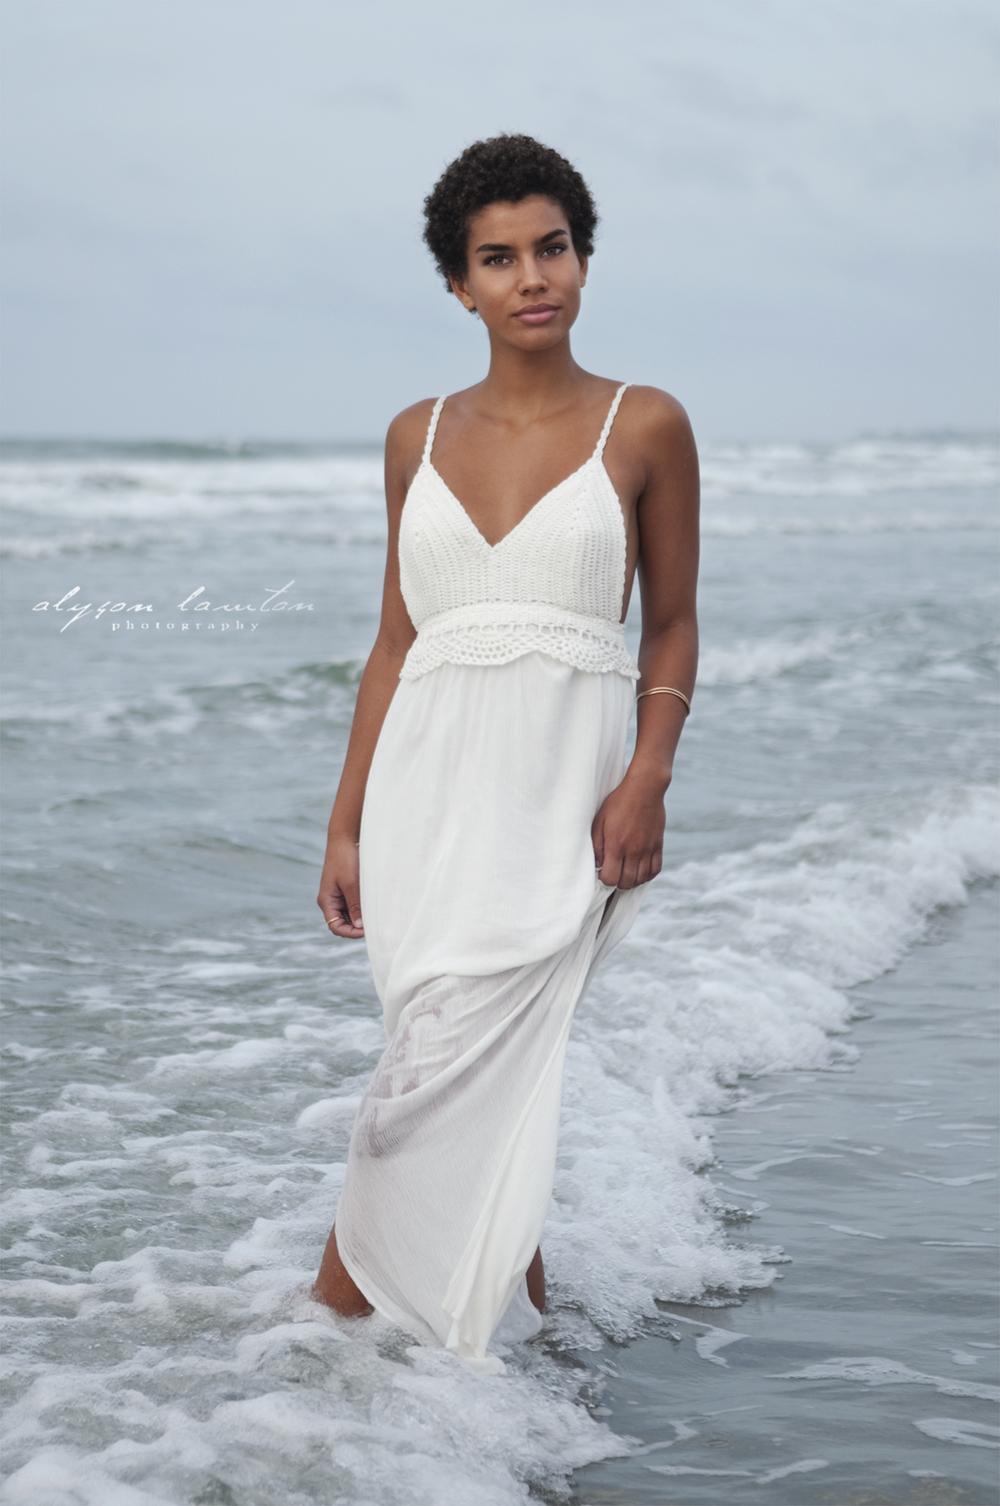 { North Carolina Wedding & BeautyPhotographer | Garden City Beach, SC| Cynthia| Alyson Lawton Photography | www.alysonlawton.com}